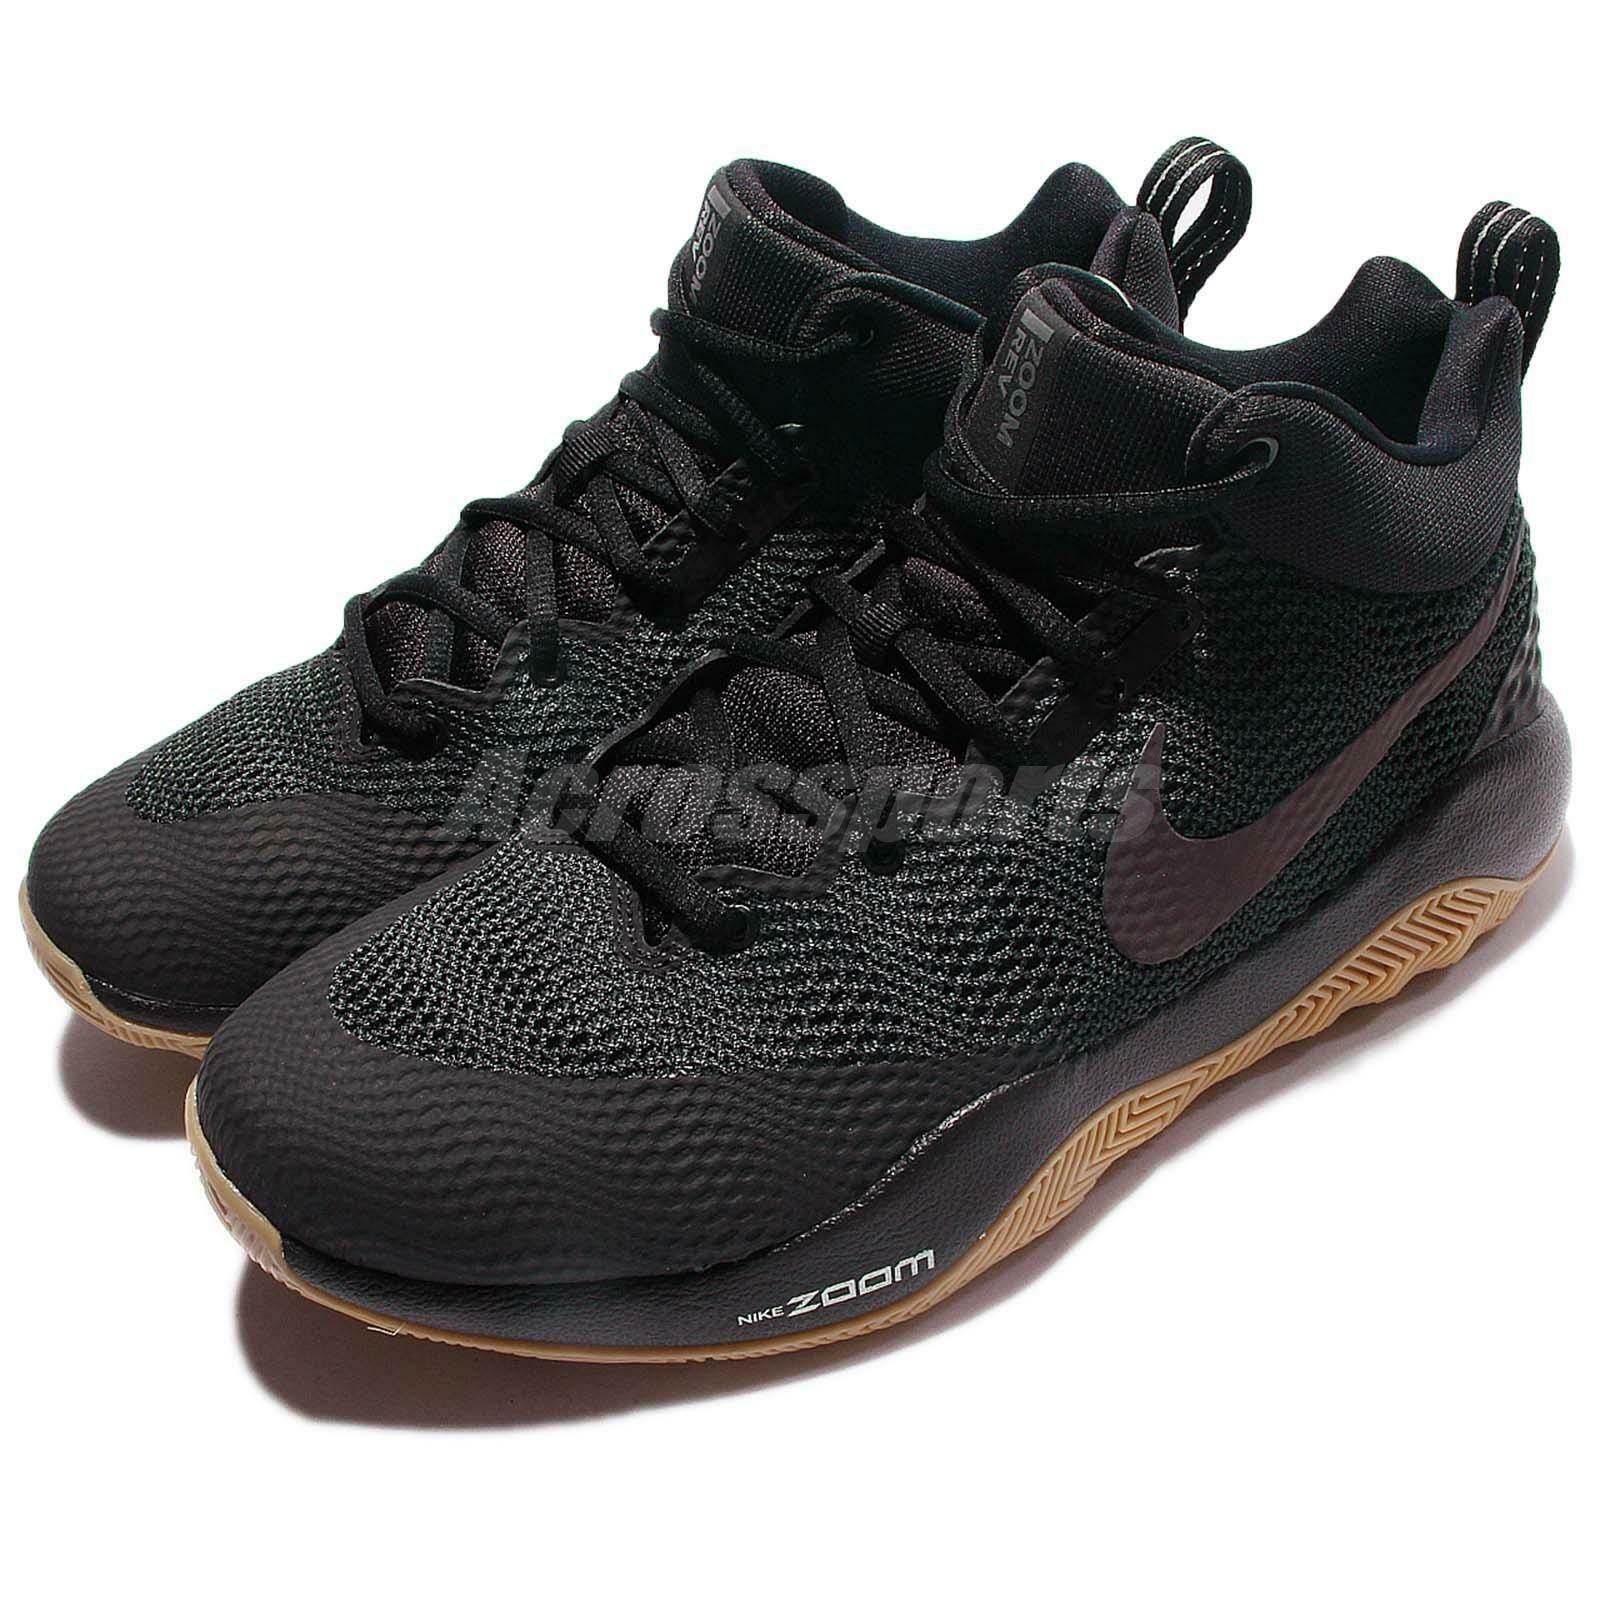 Nike Zoom Rev EP 2017 Black Gum Men Basketball Shoes Sneakers 852423-010